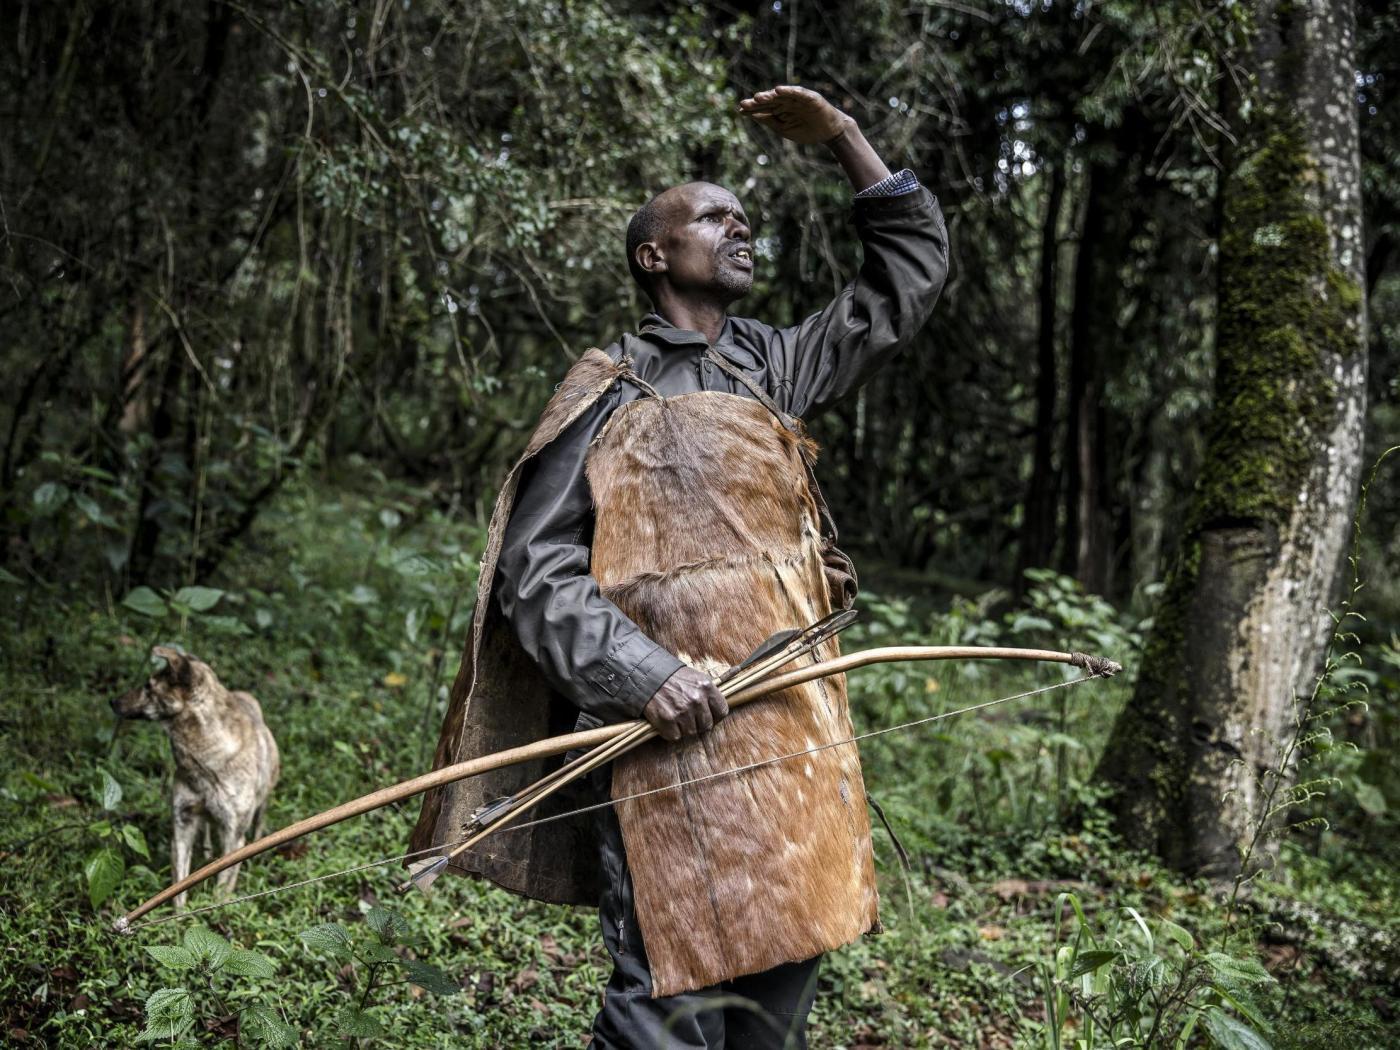 Ogiek hunter Joseph Kipkemoi Lesingo surveys a tree holding a beehive before collecting honey on a cold day